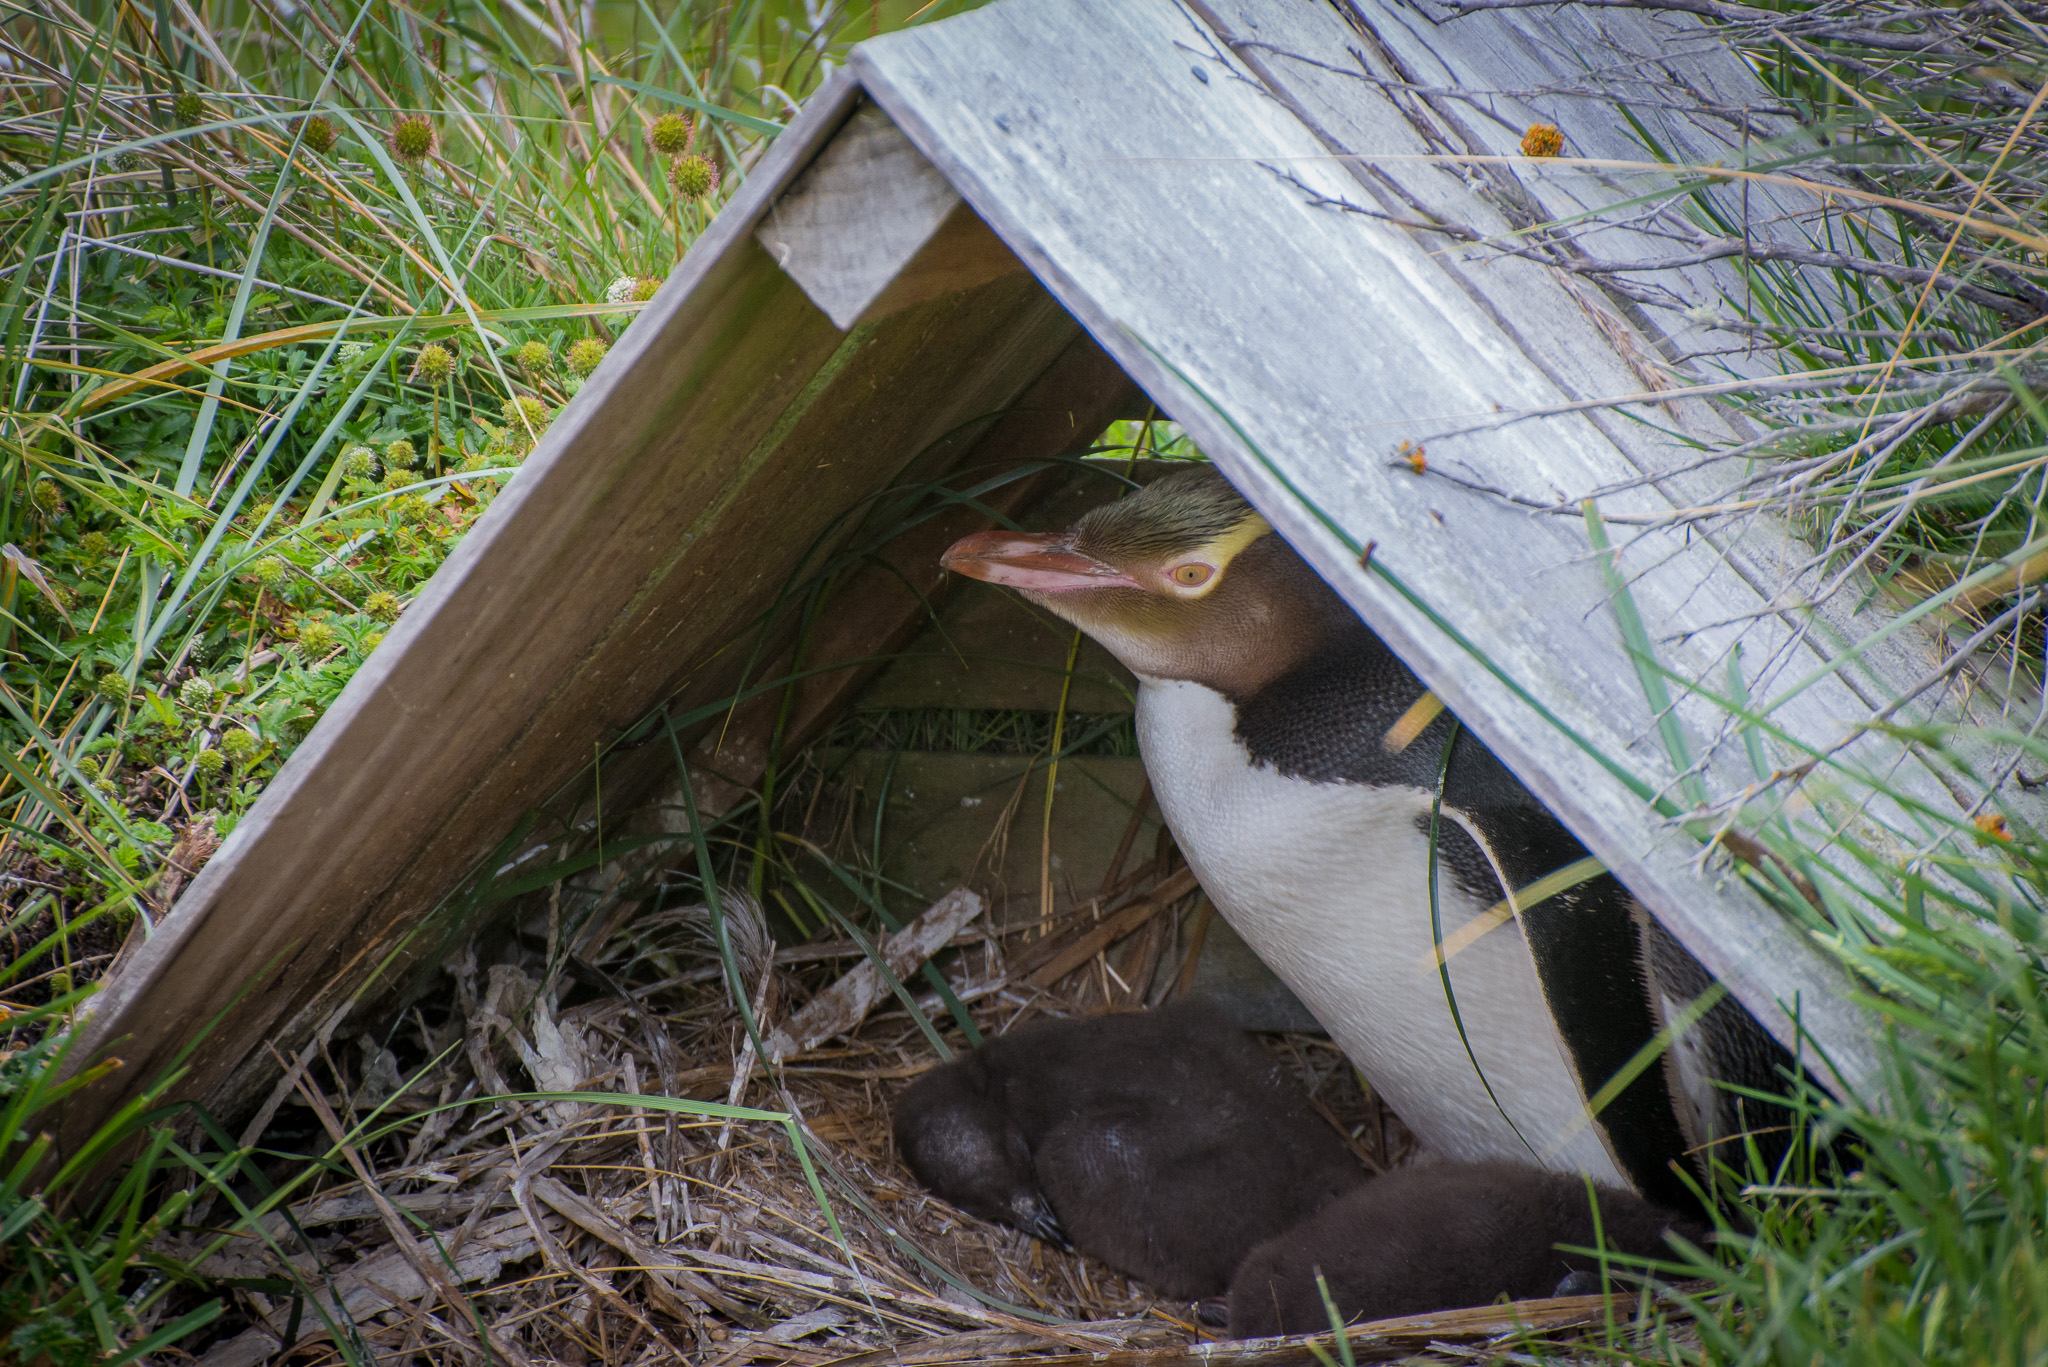 Yellow Eyed Penguins, Harington Point, South Island, New Zealand